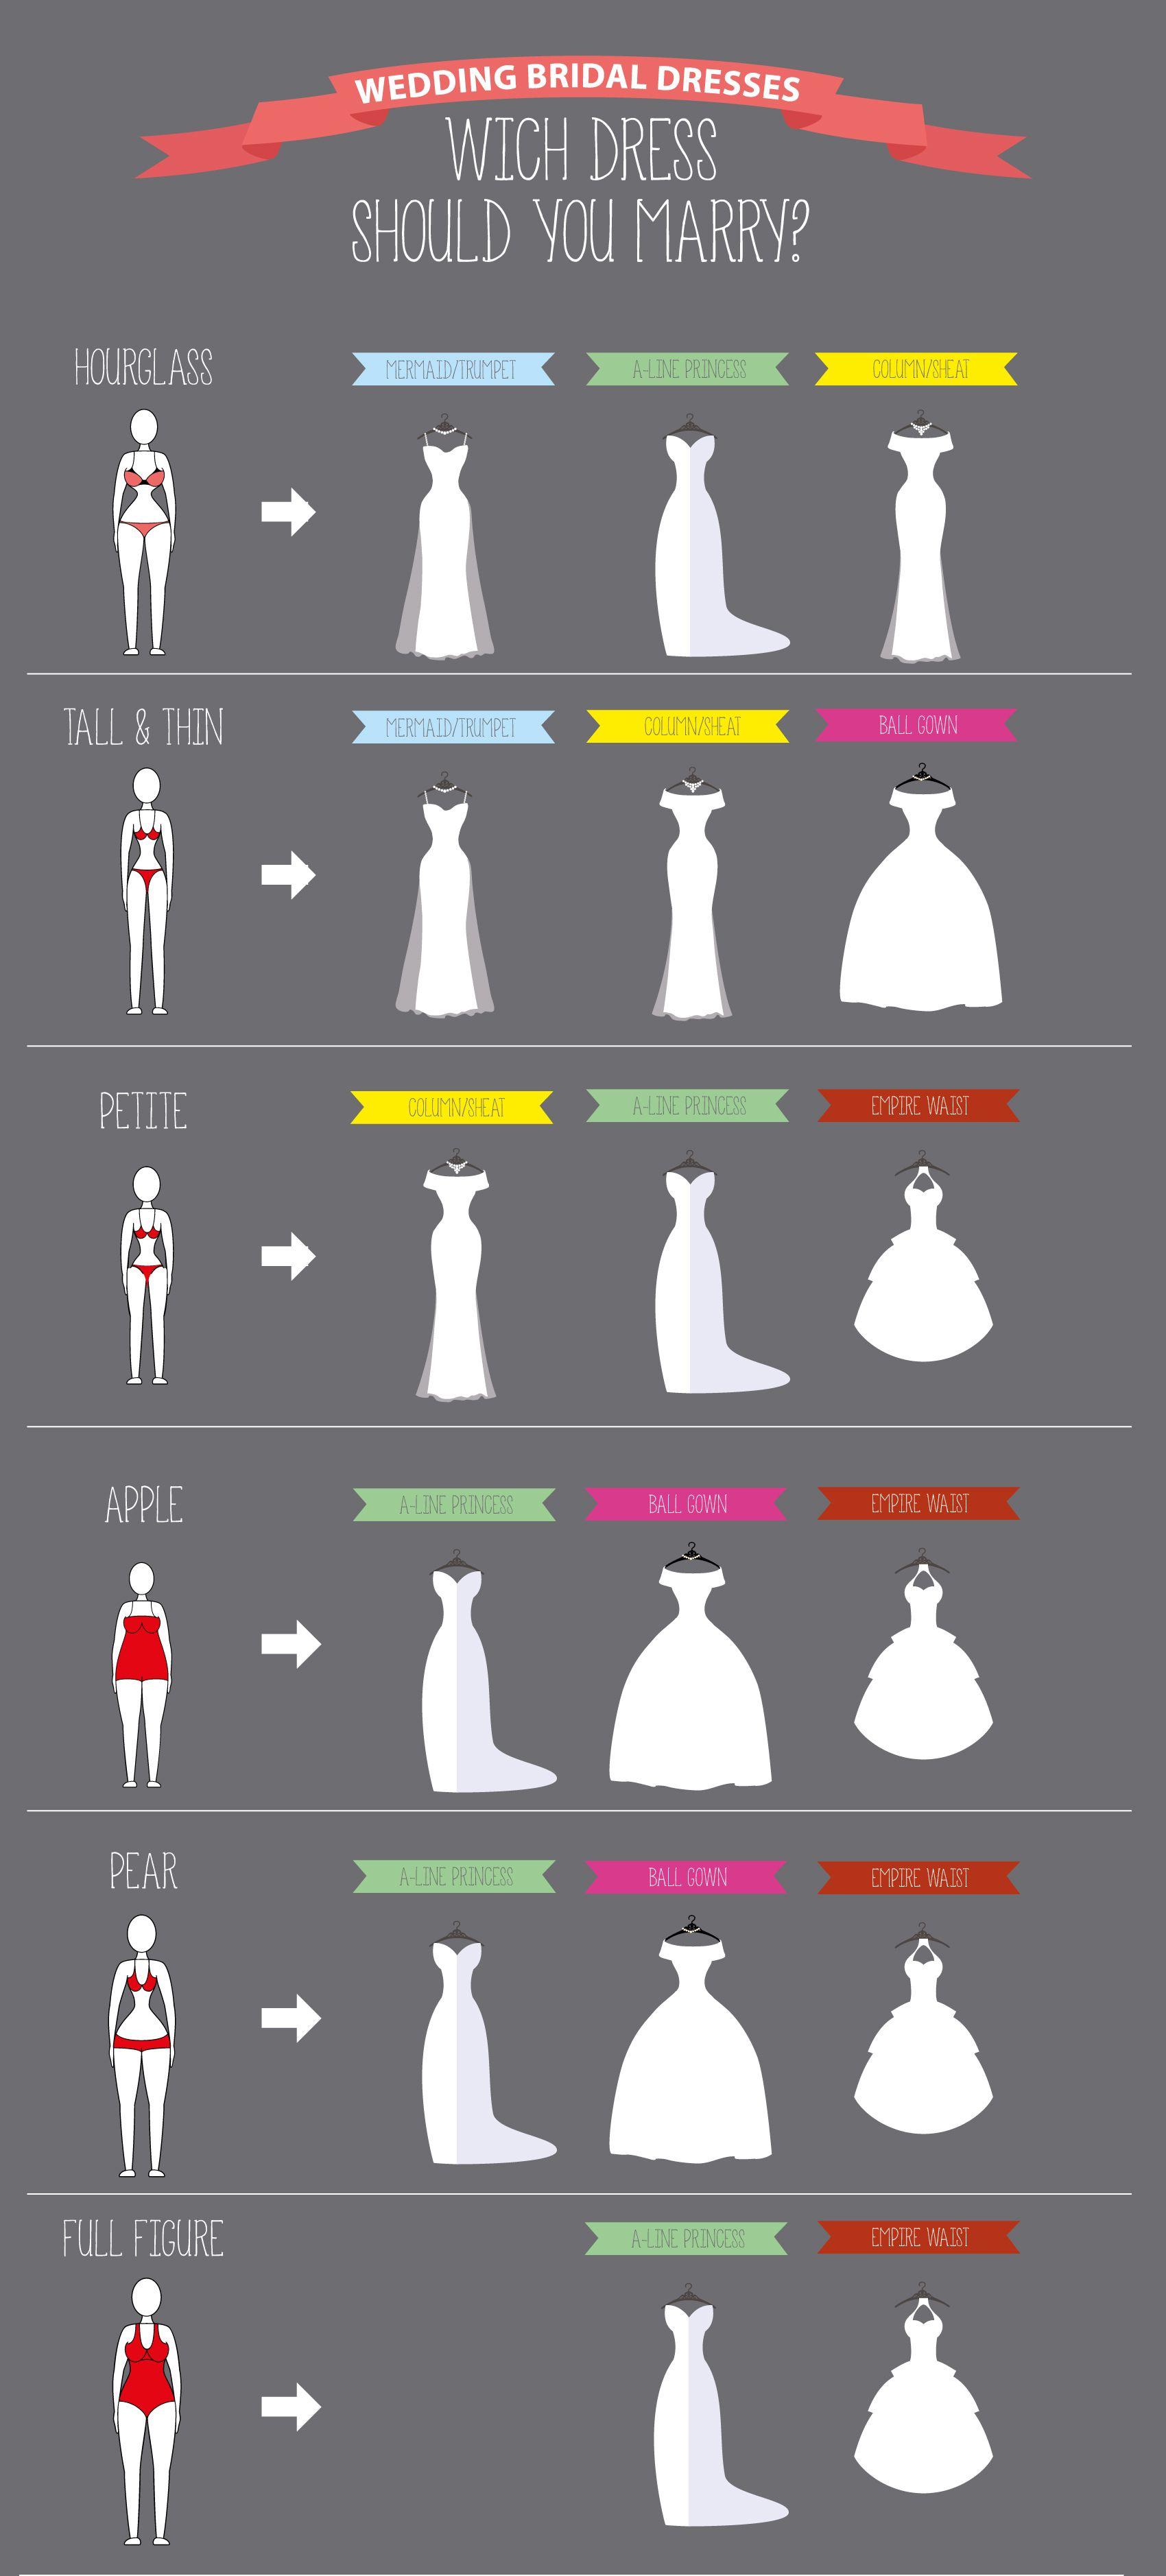 Ultimate Guide To Wedding Dresses Wedding blog Wedding dress and